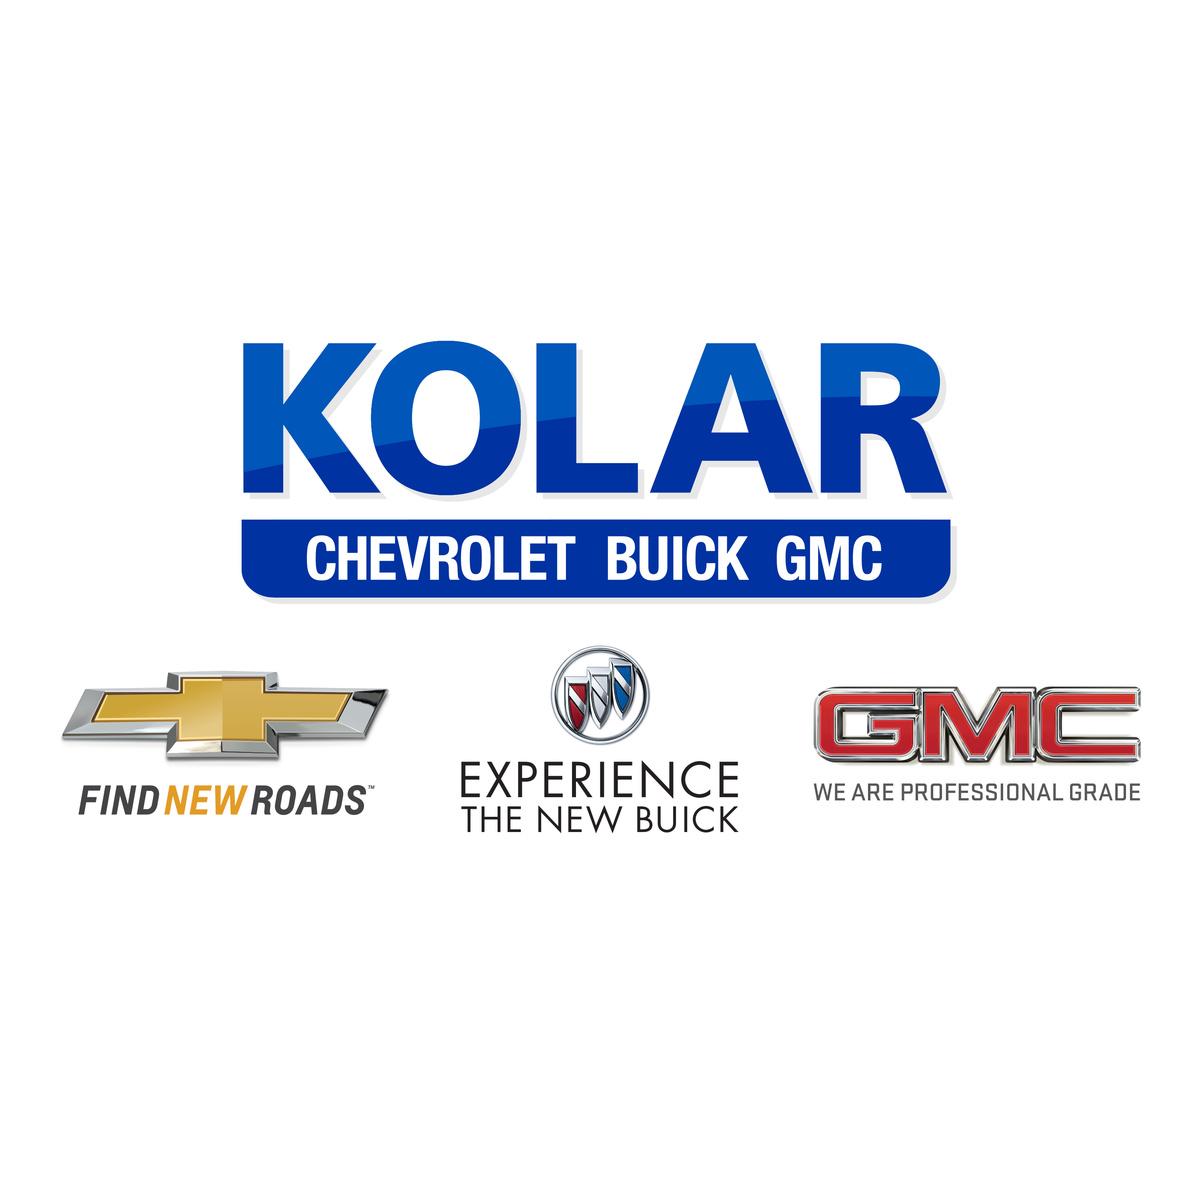 Kia Of Duluth >> Kolar Chevrolet Buick GMC Cadillac - Hermantown, MN: Read ...